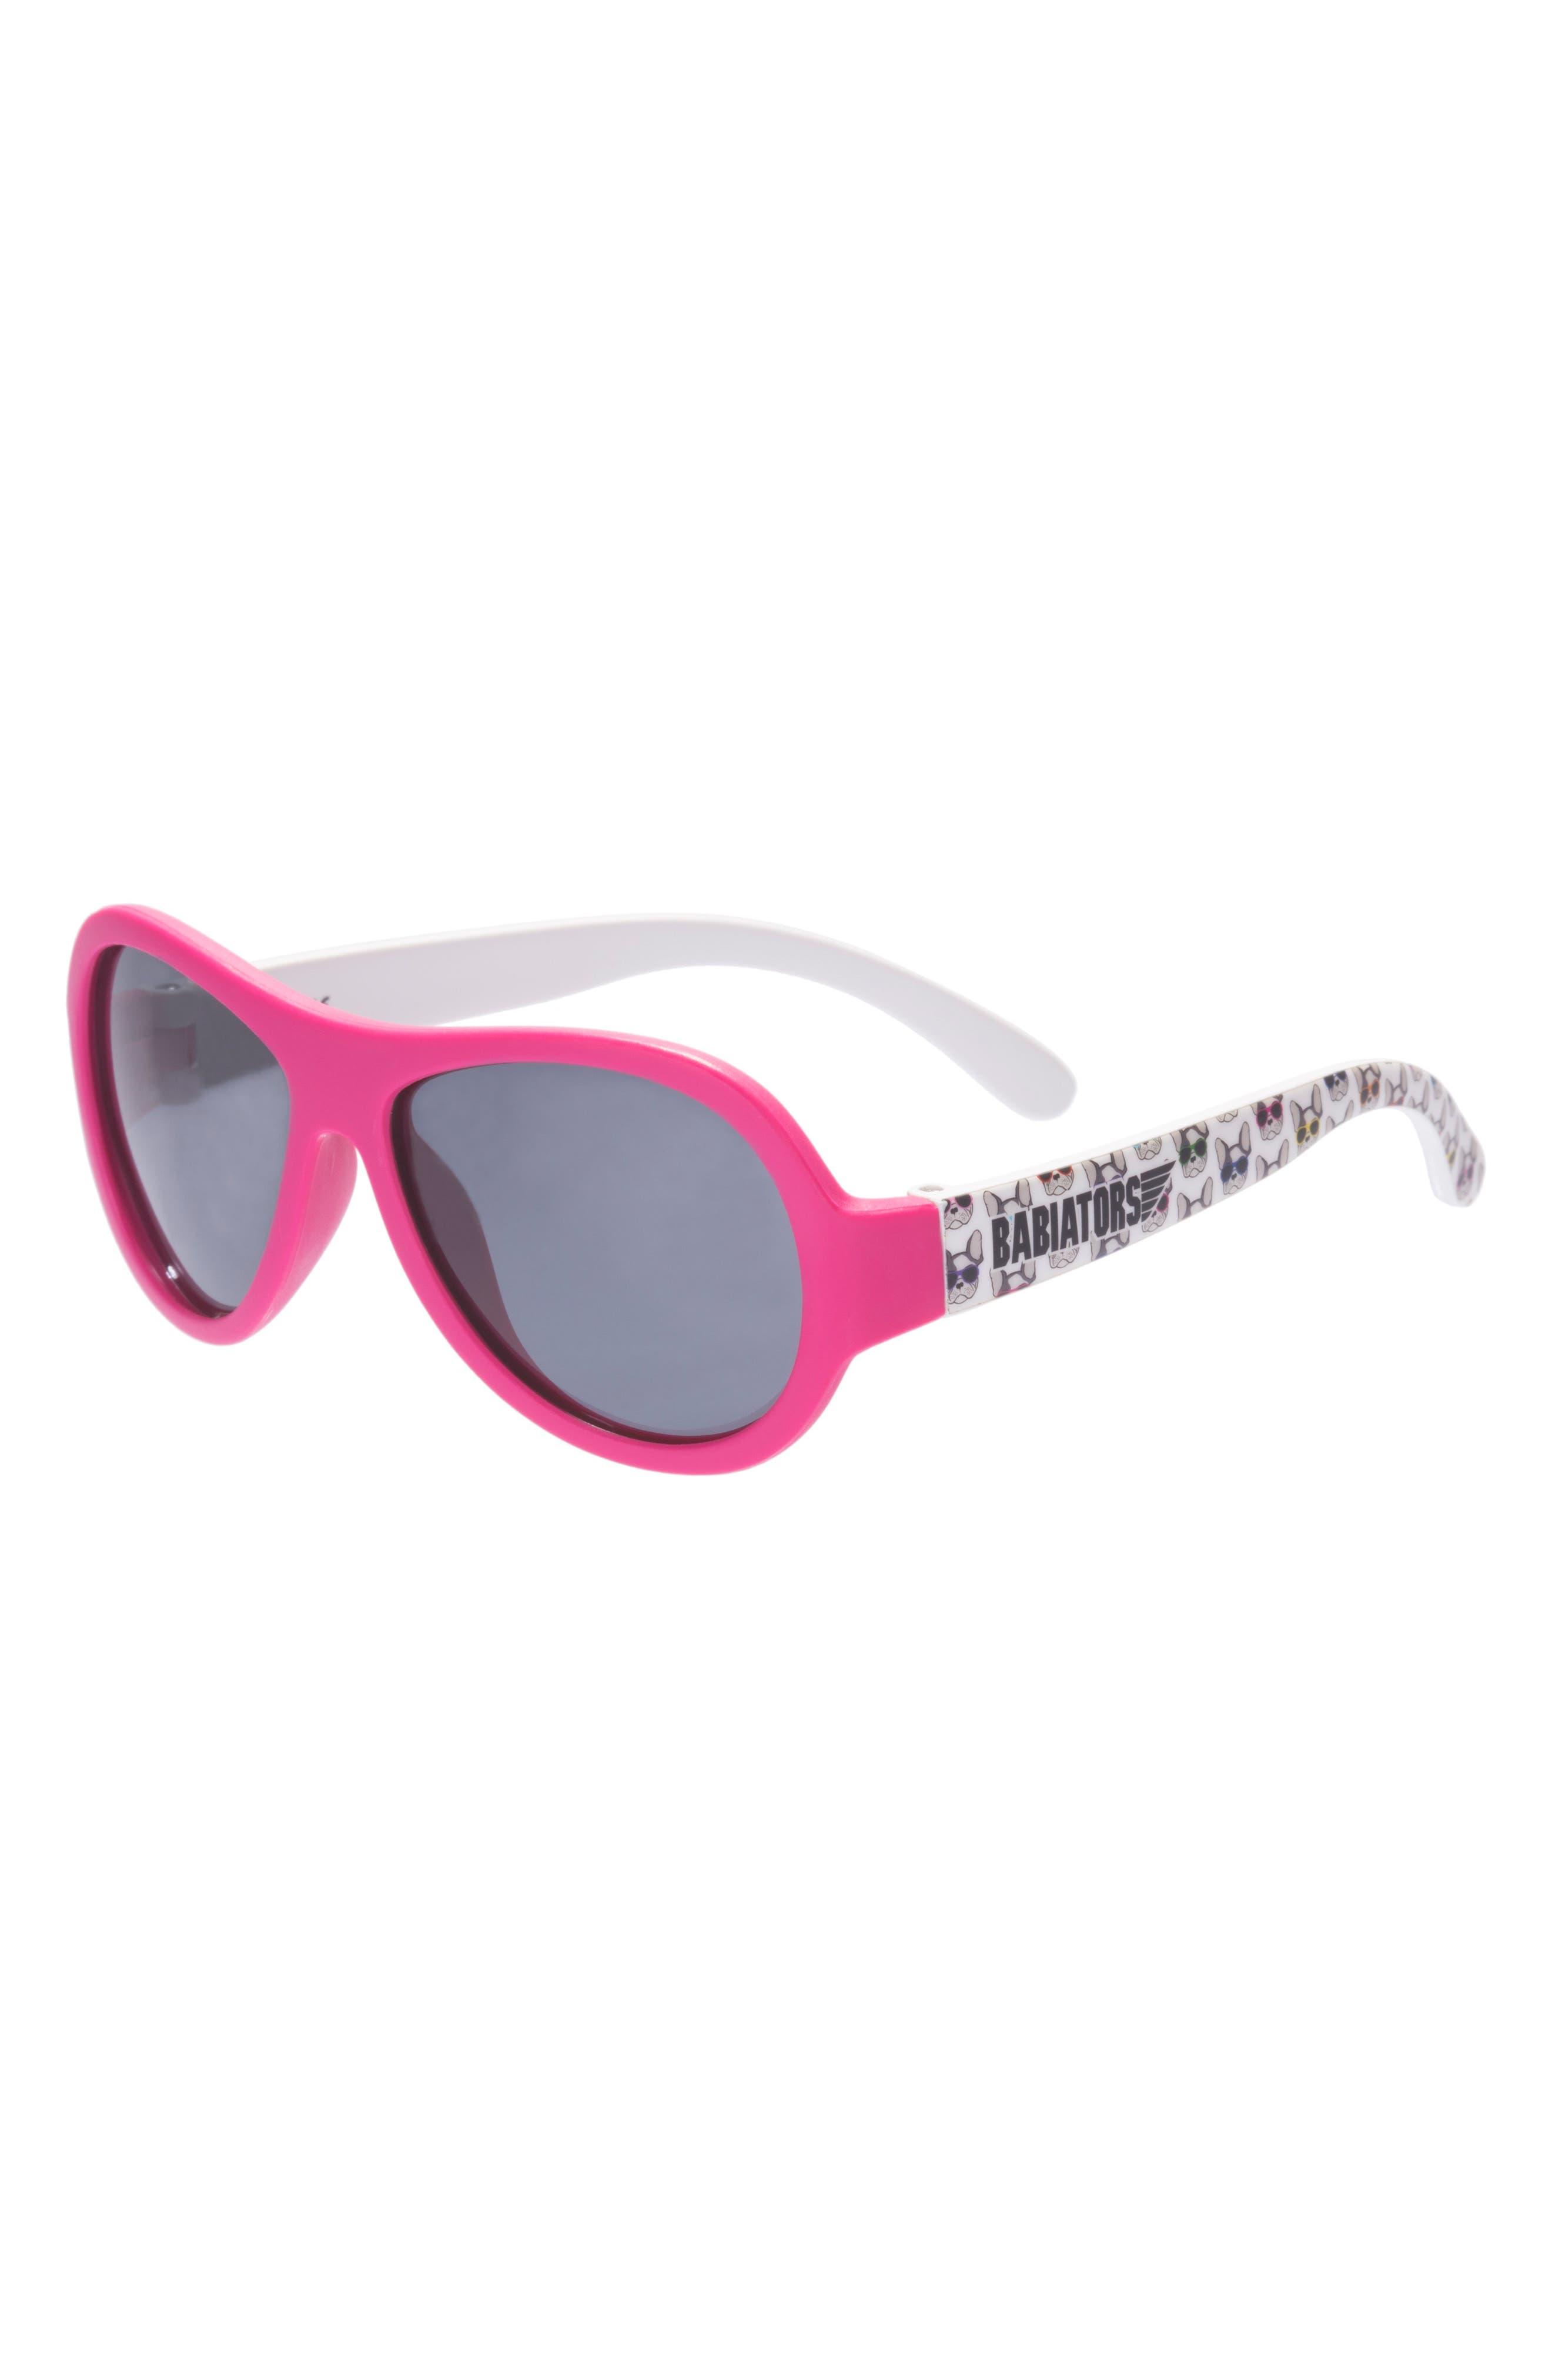 Puppy Print Polarized Aviator Sunglasses,                         Main,                         color, PUPPY LOVE